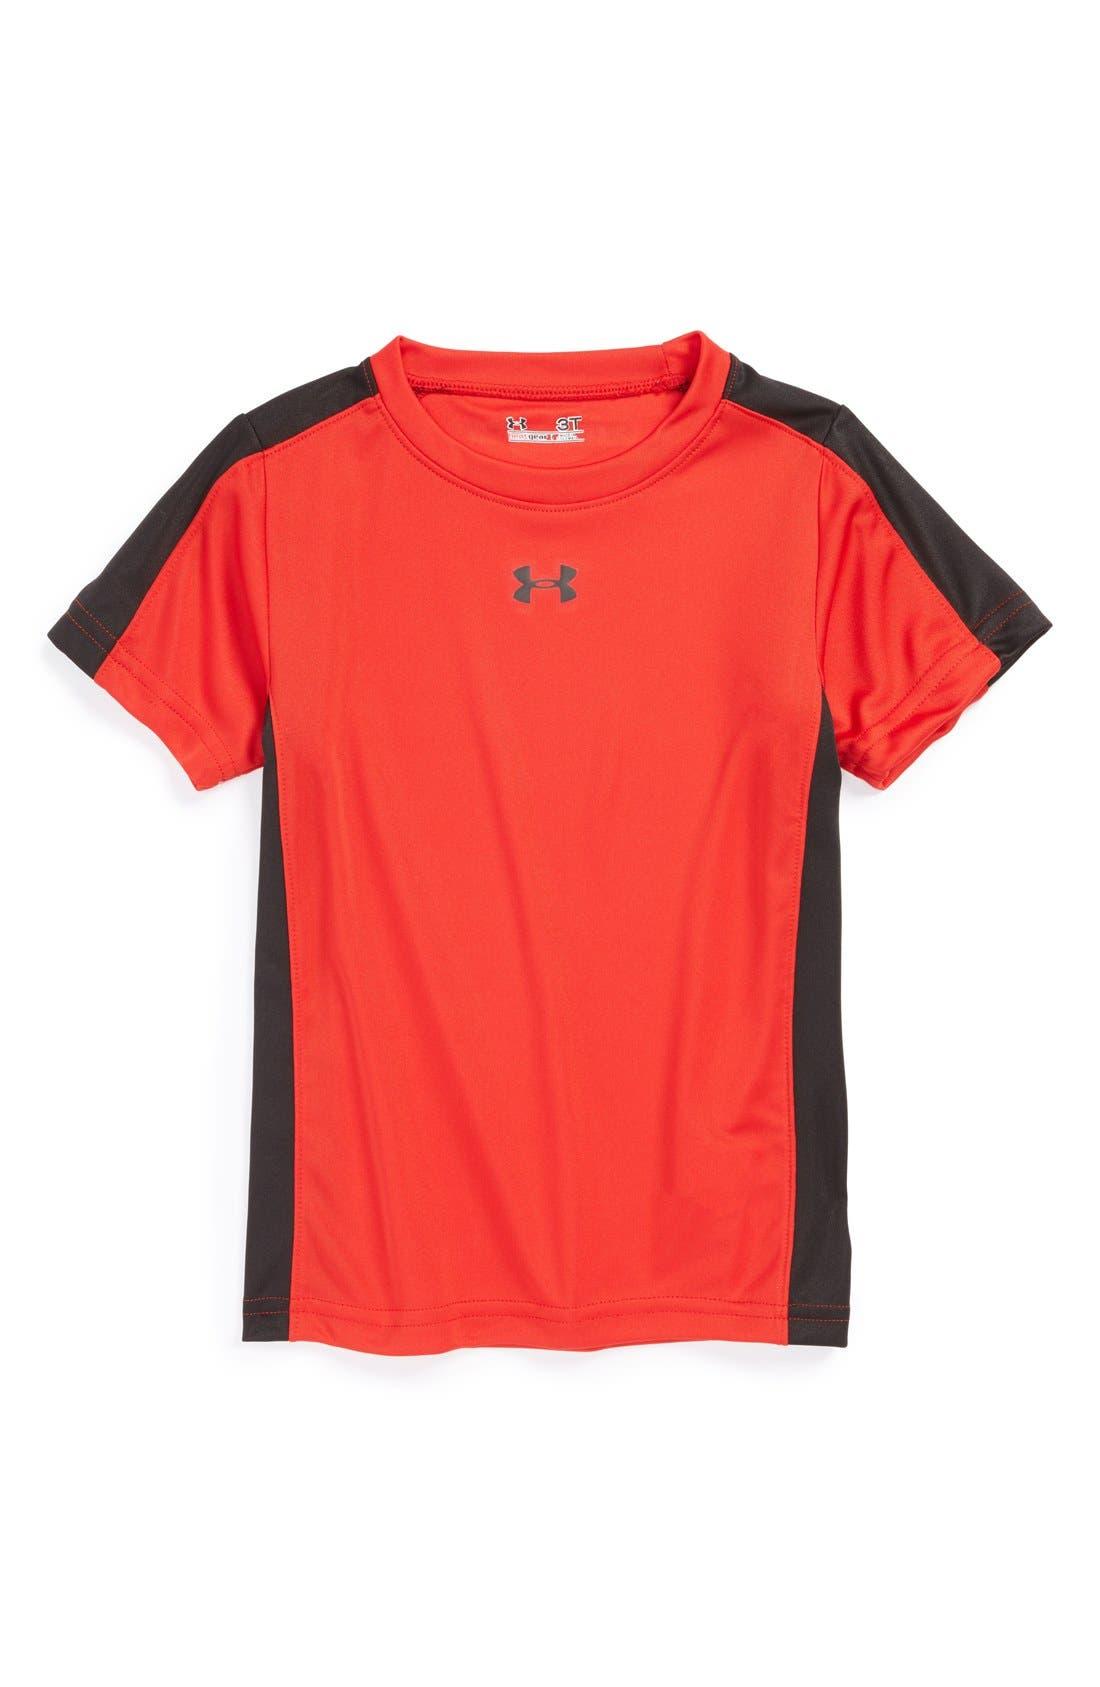 Main Image - Under Armour 'Souped Up' HeatGear® T-Shirt (Toddler Boys)